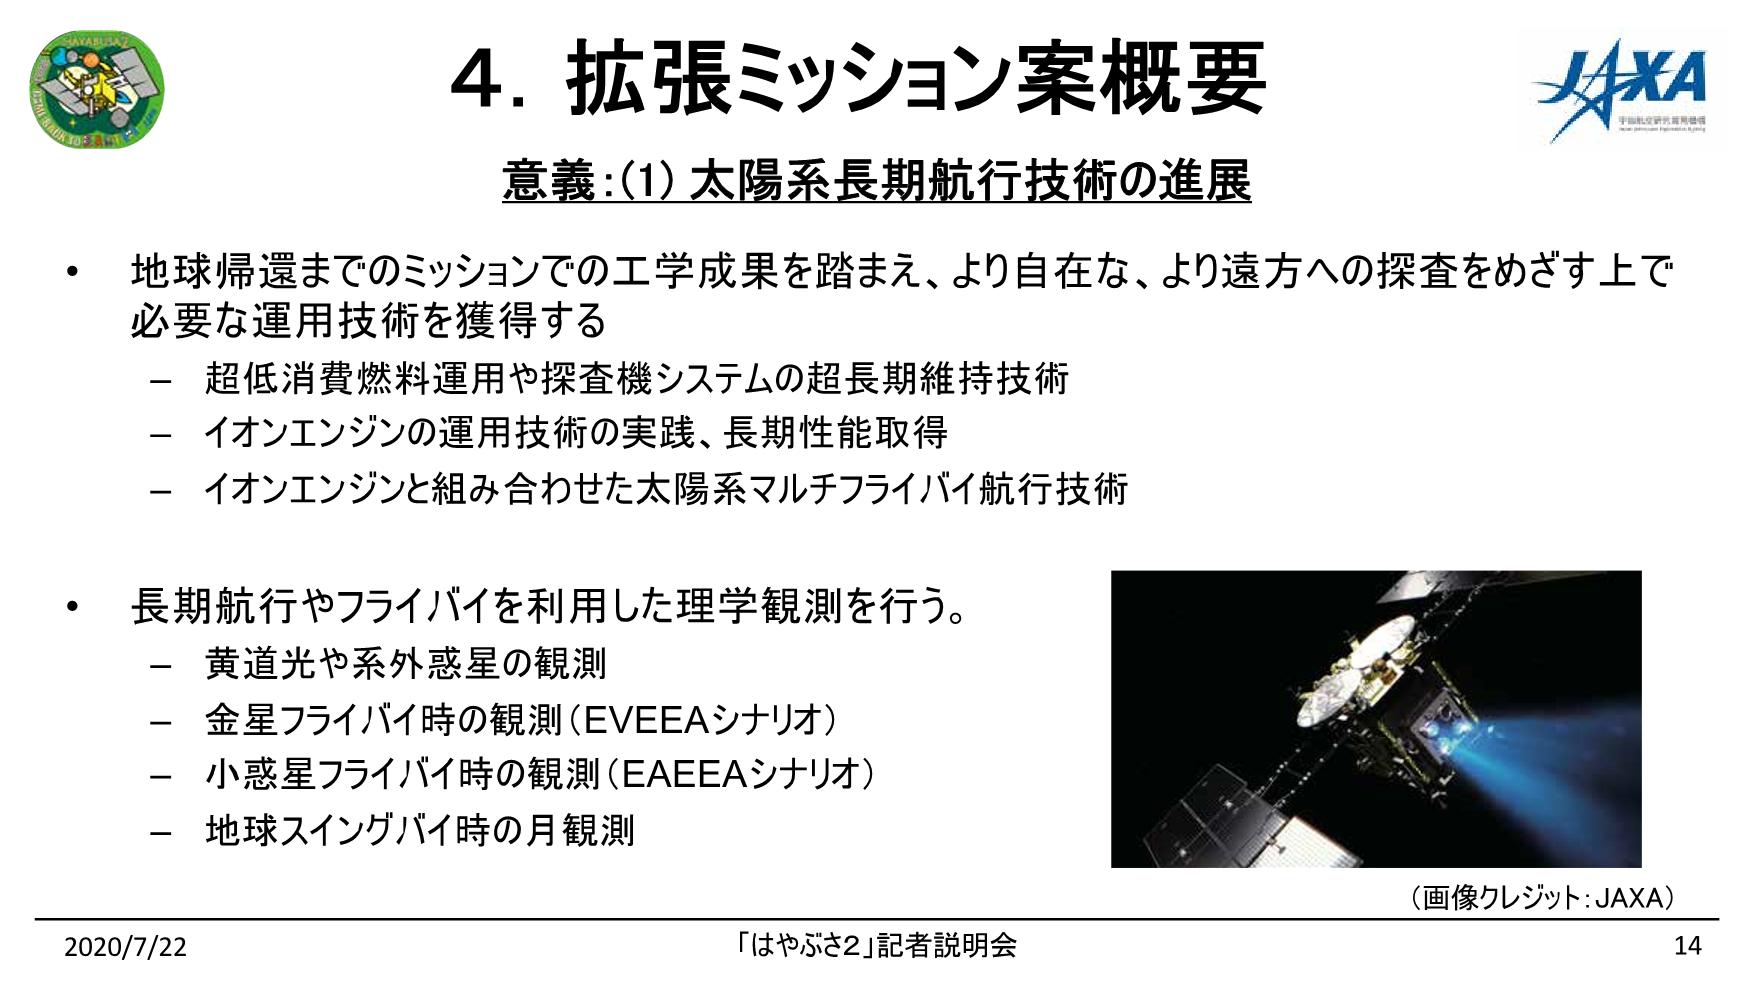 f:id:Imamura:20200722140734p:plain